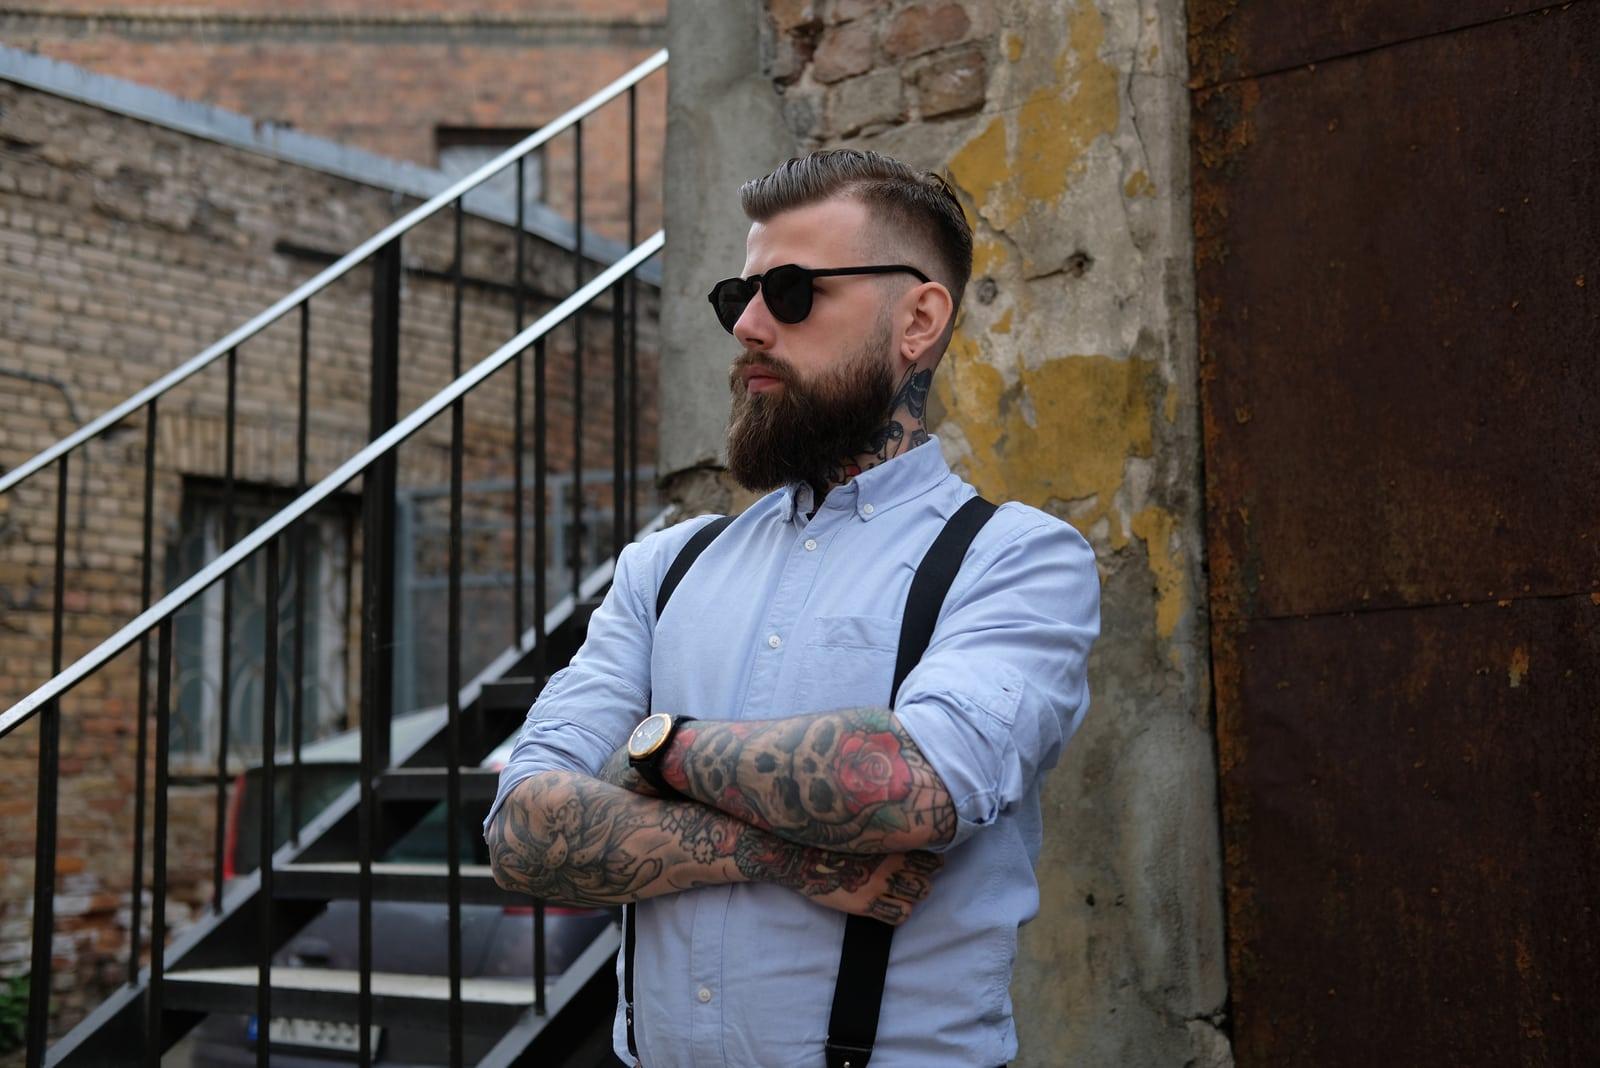 tattooed man wearing sunglasses